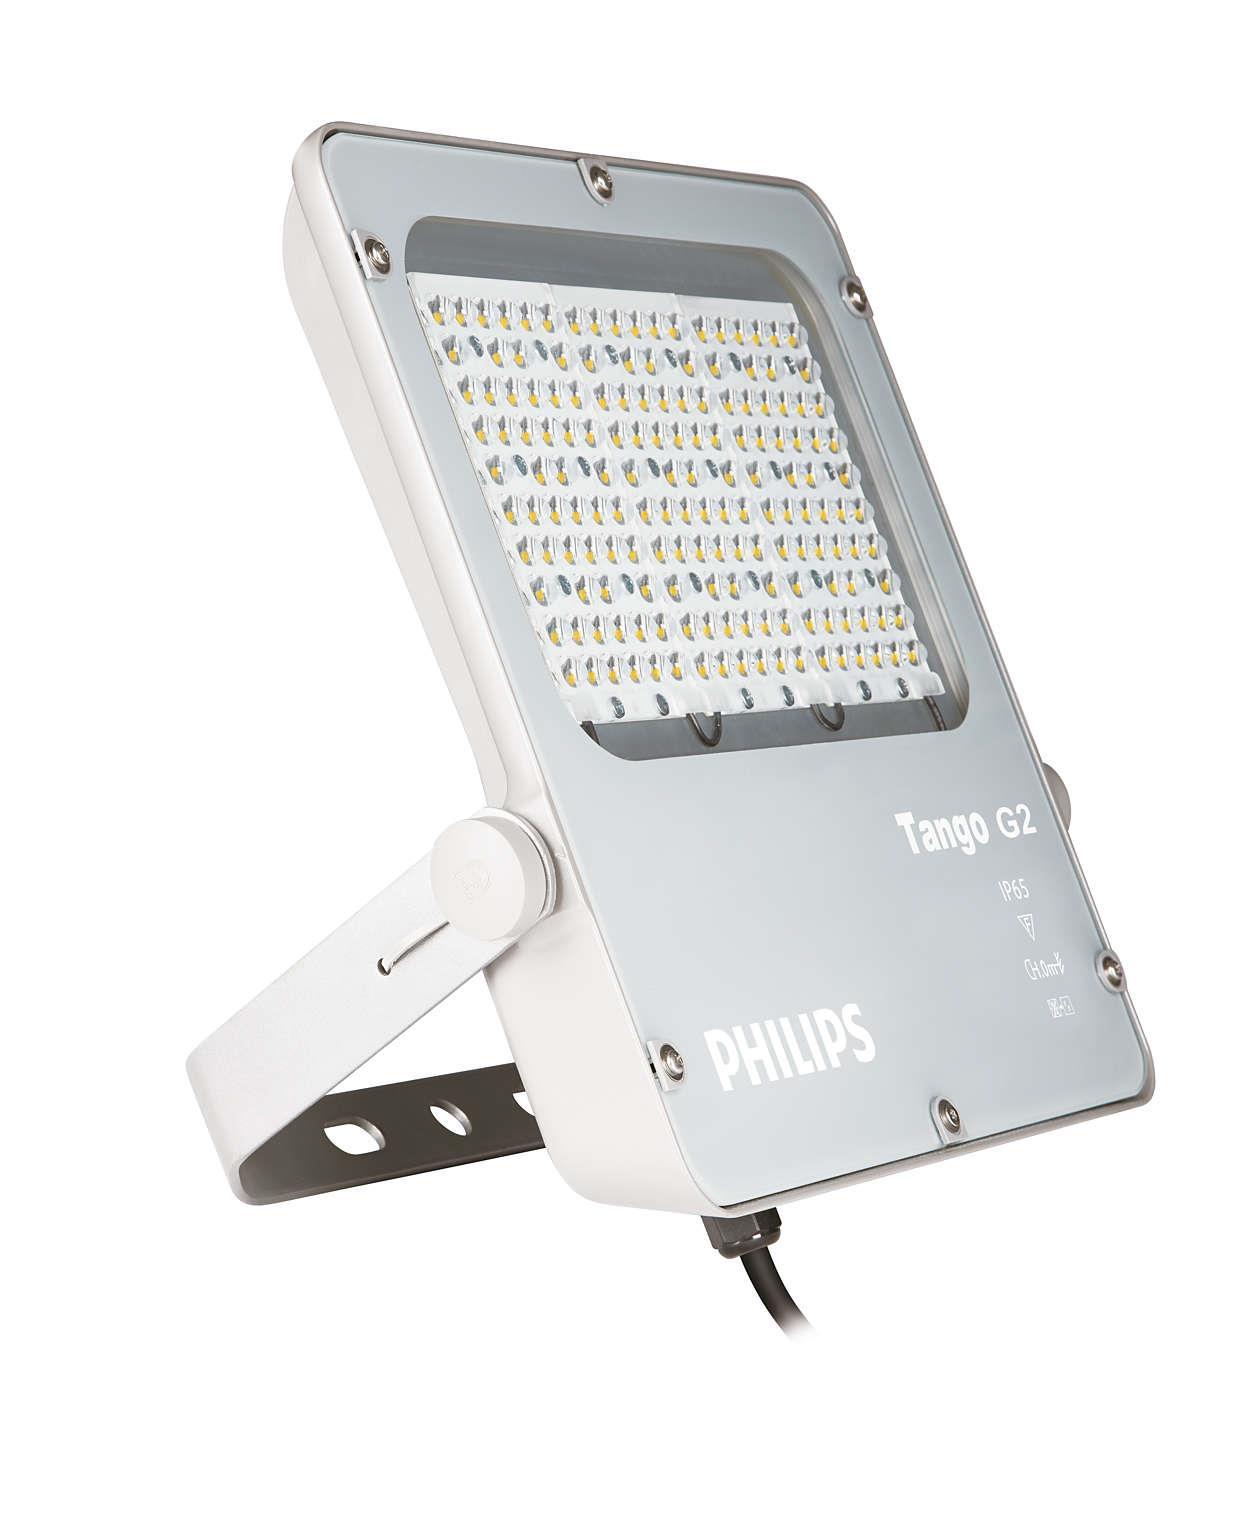 Jual Lampu Sorot LED / Flood Light Philips BVP281 -80W AC